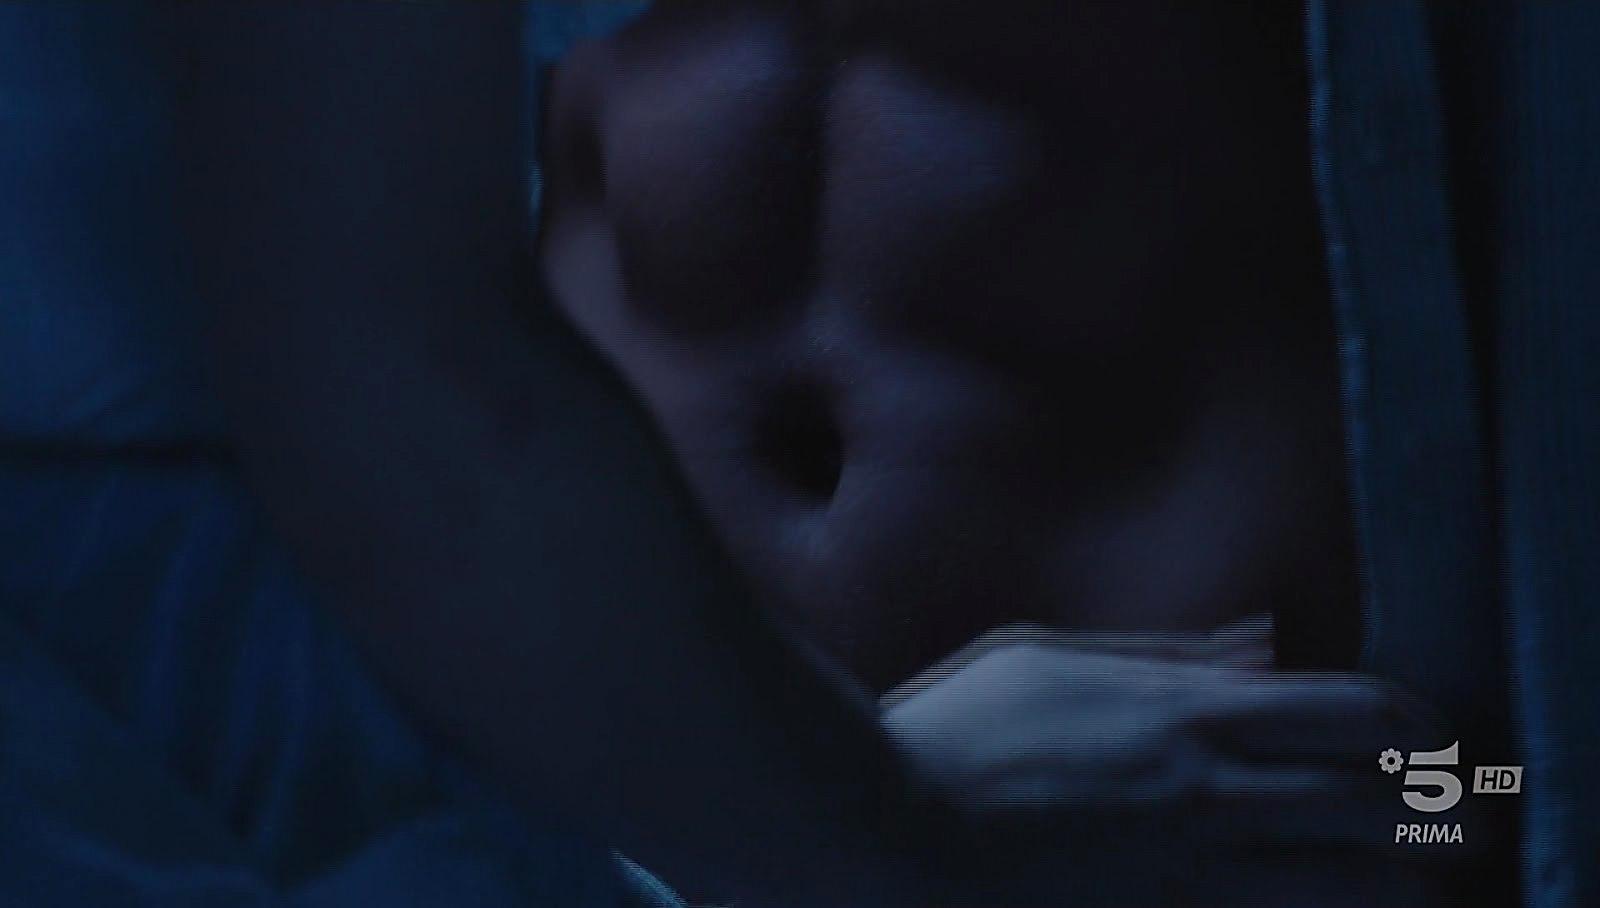 Francesco Arca sexy shirtless scene July 10, 2018, 11am